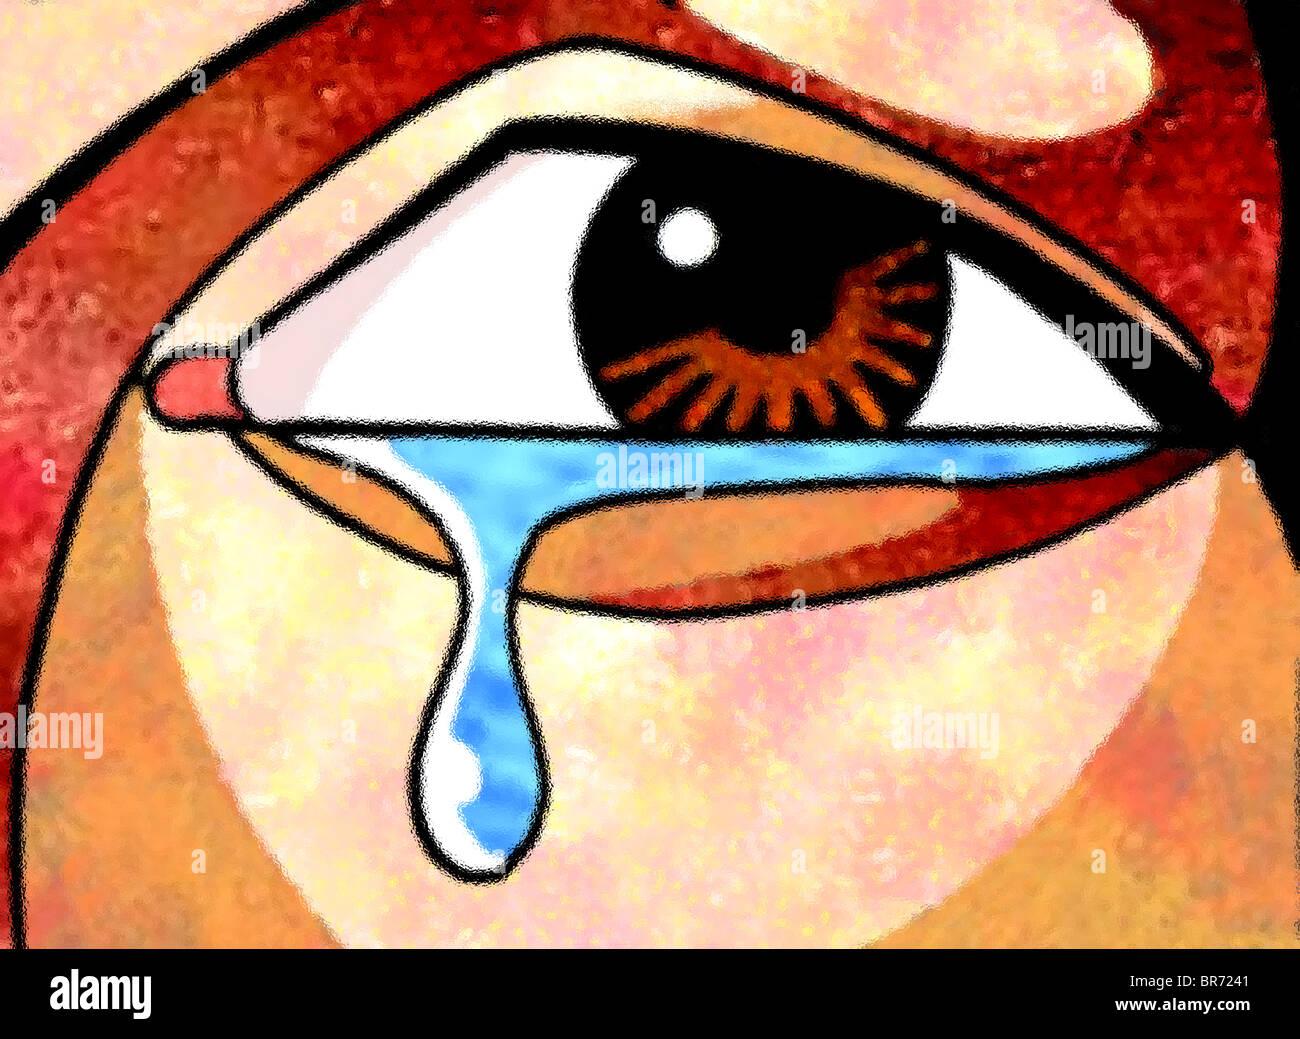 A graphical representation of sadness - Stock Image